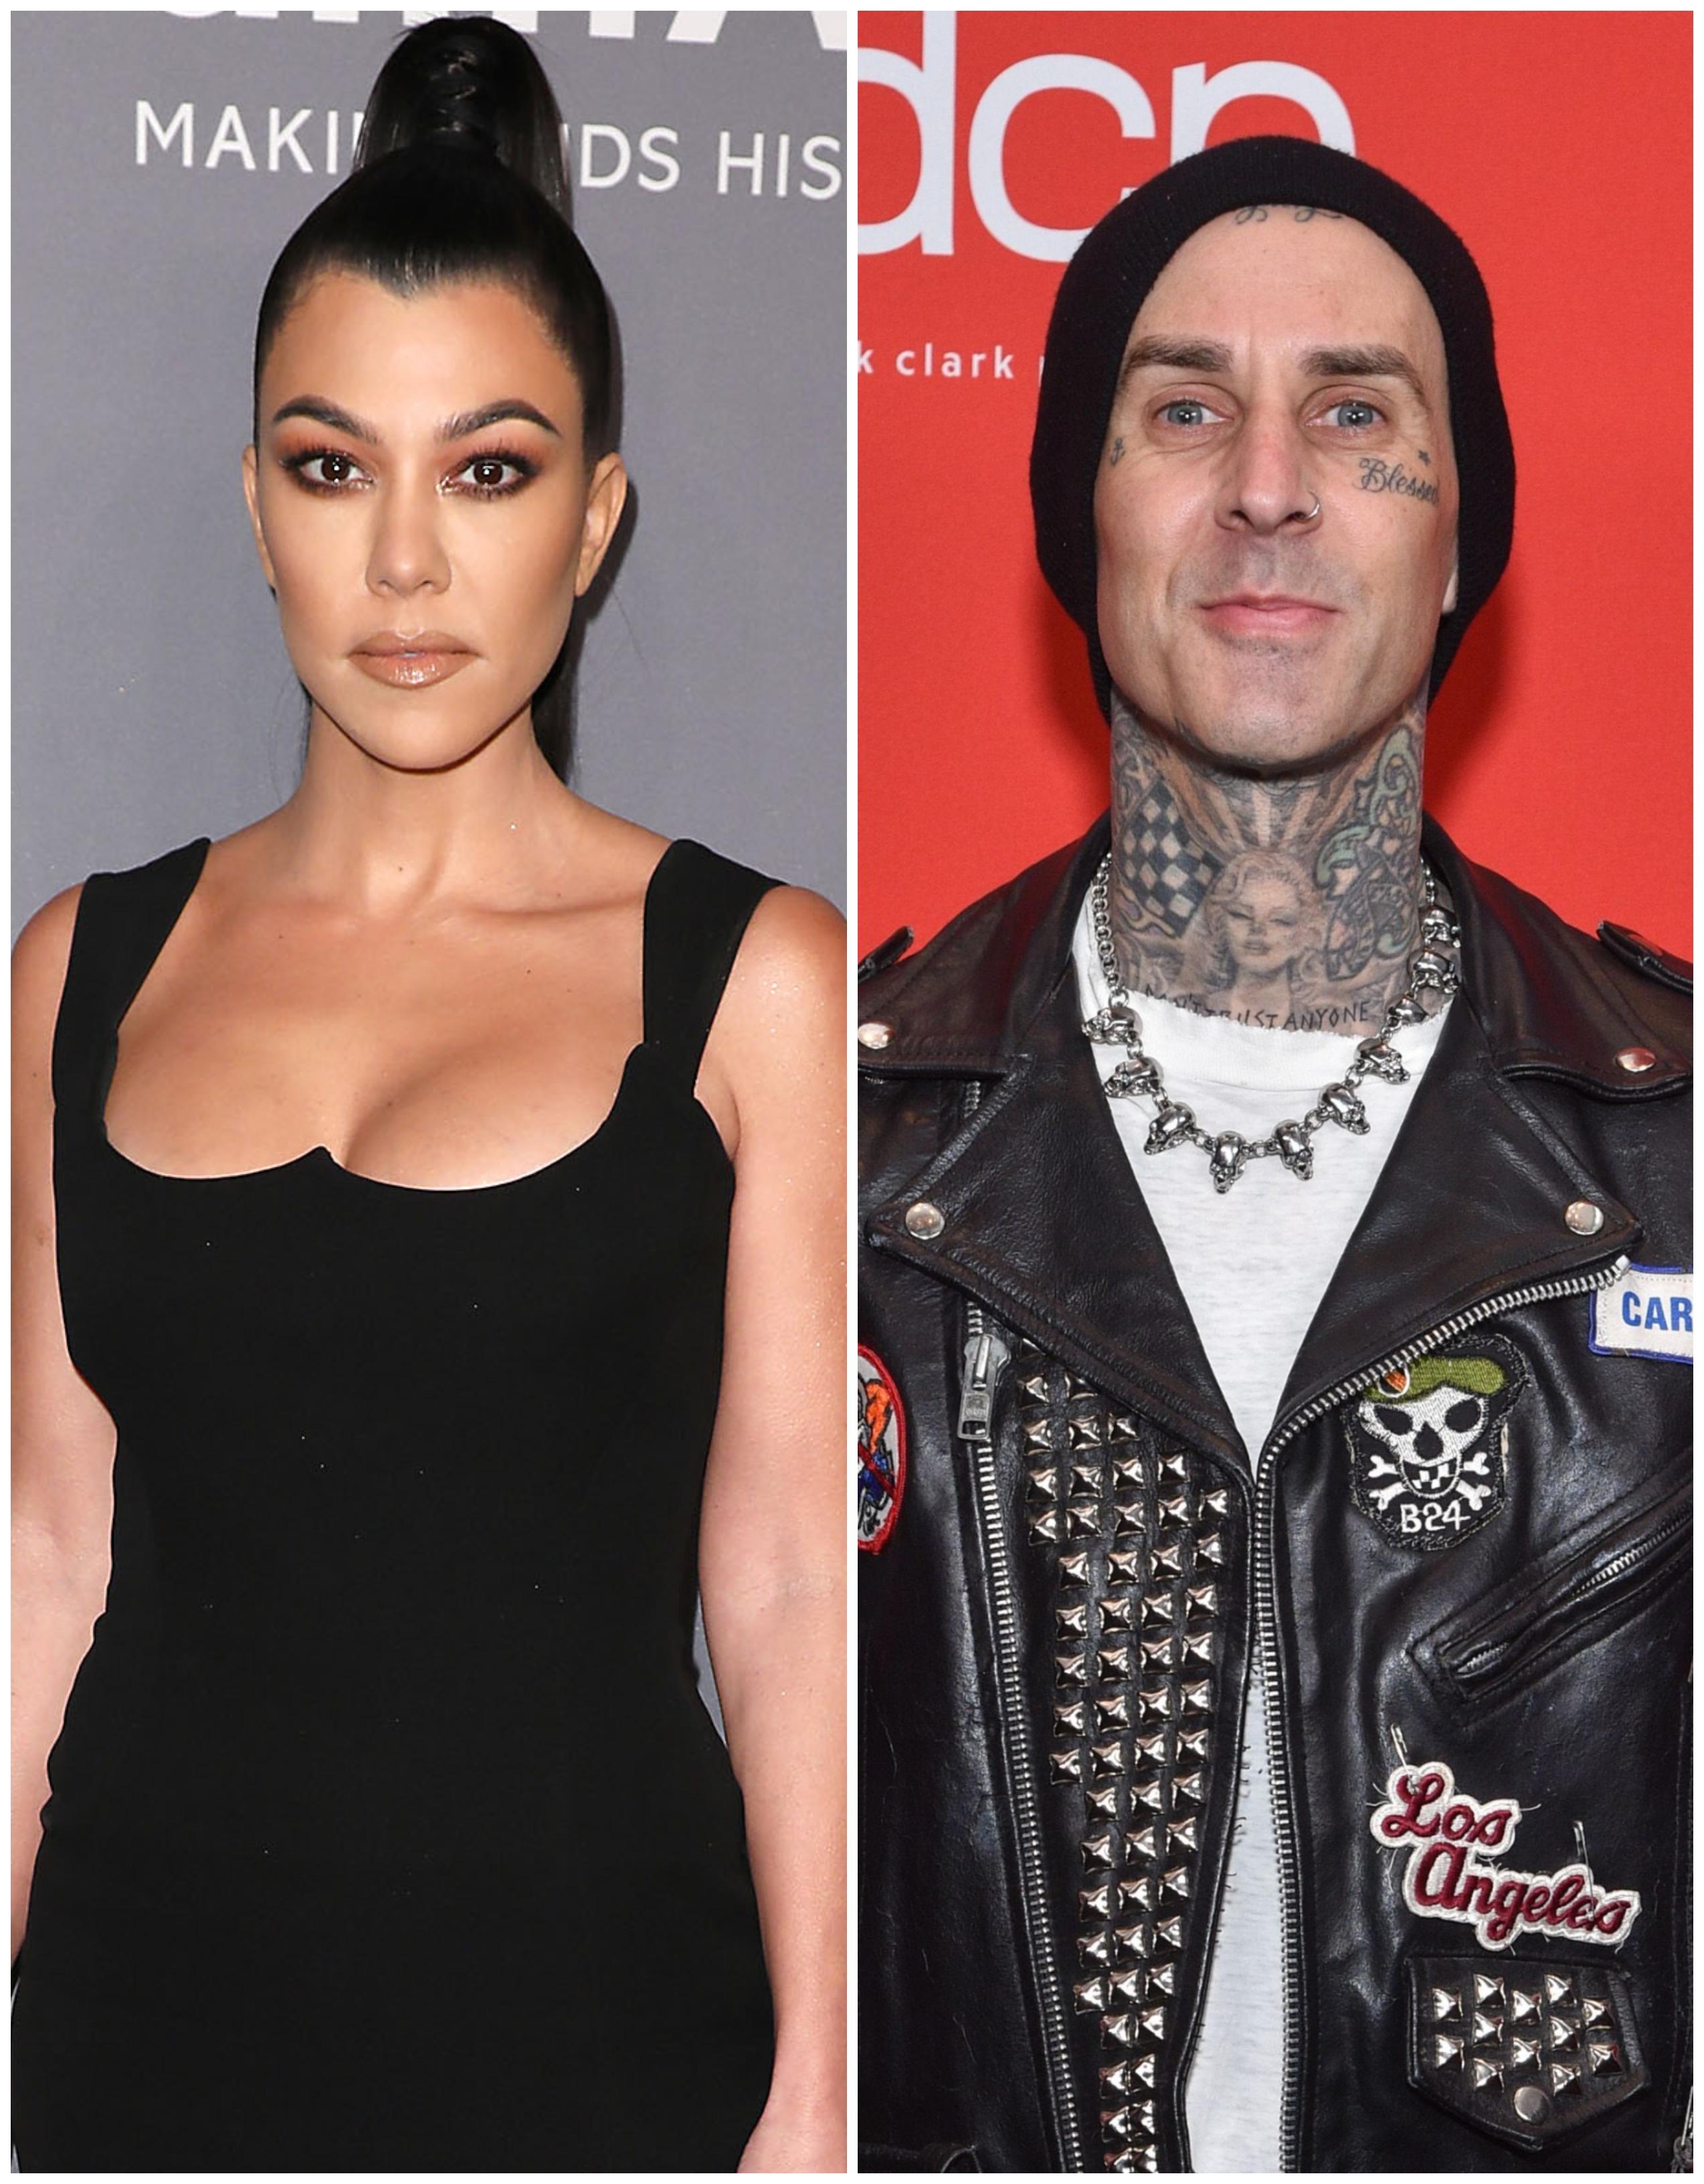 Kourtney Kardashian and Travis Barker Go Instagram Official, Hold Hands